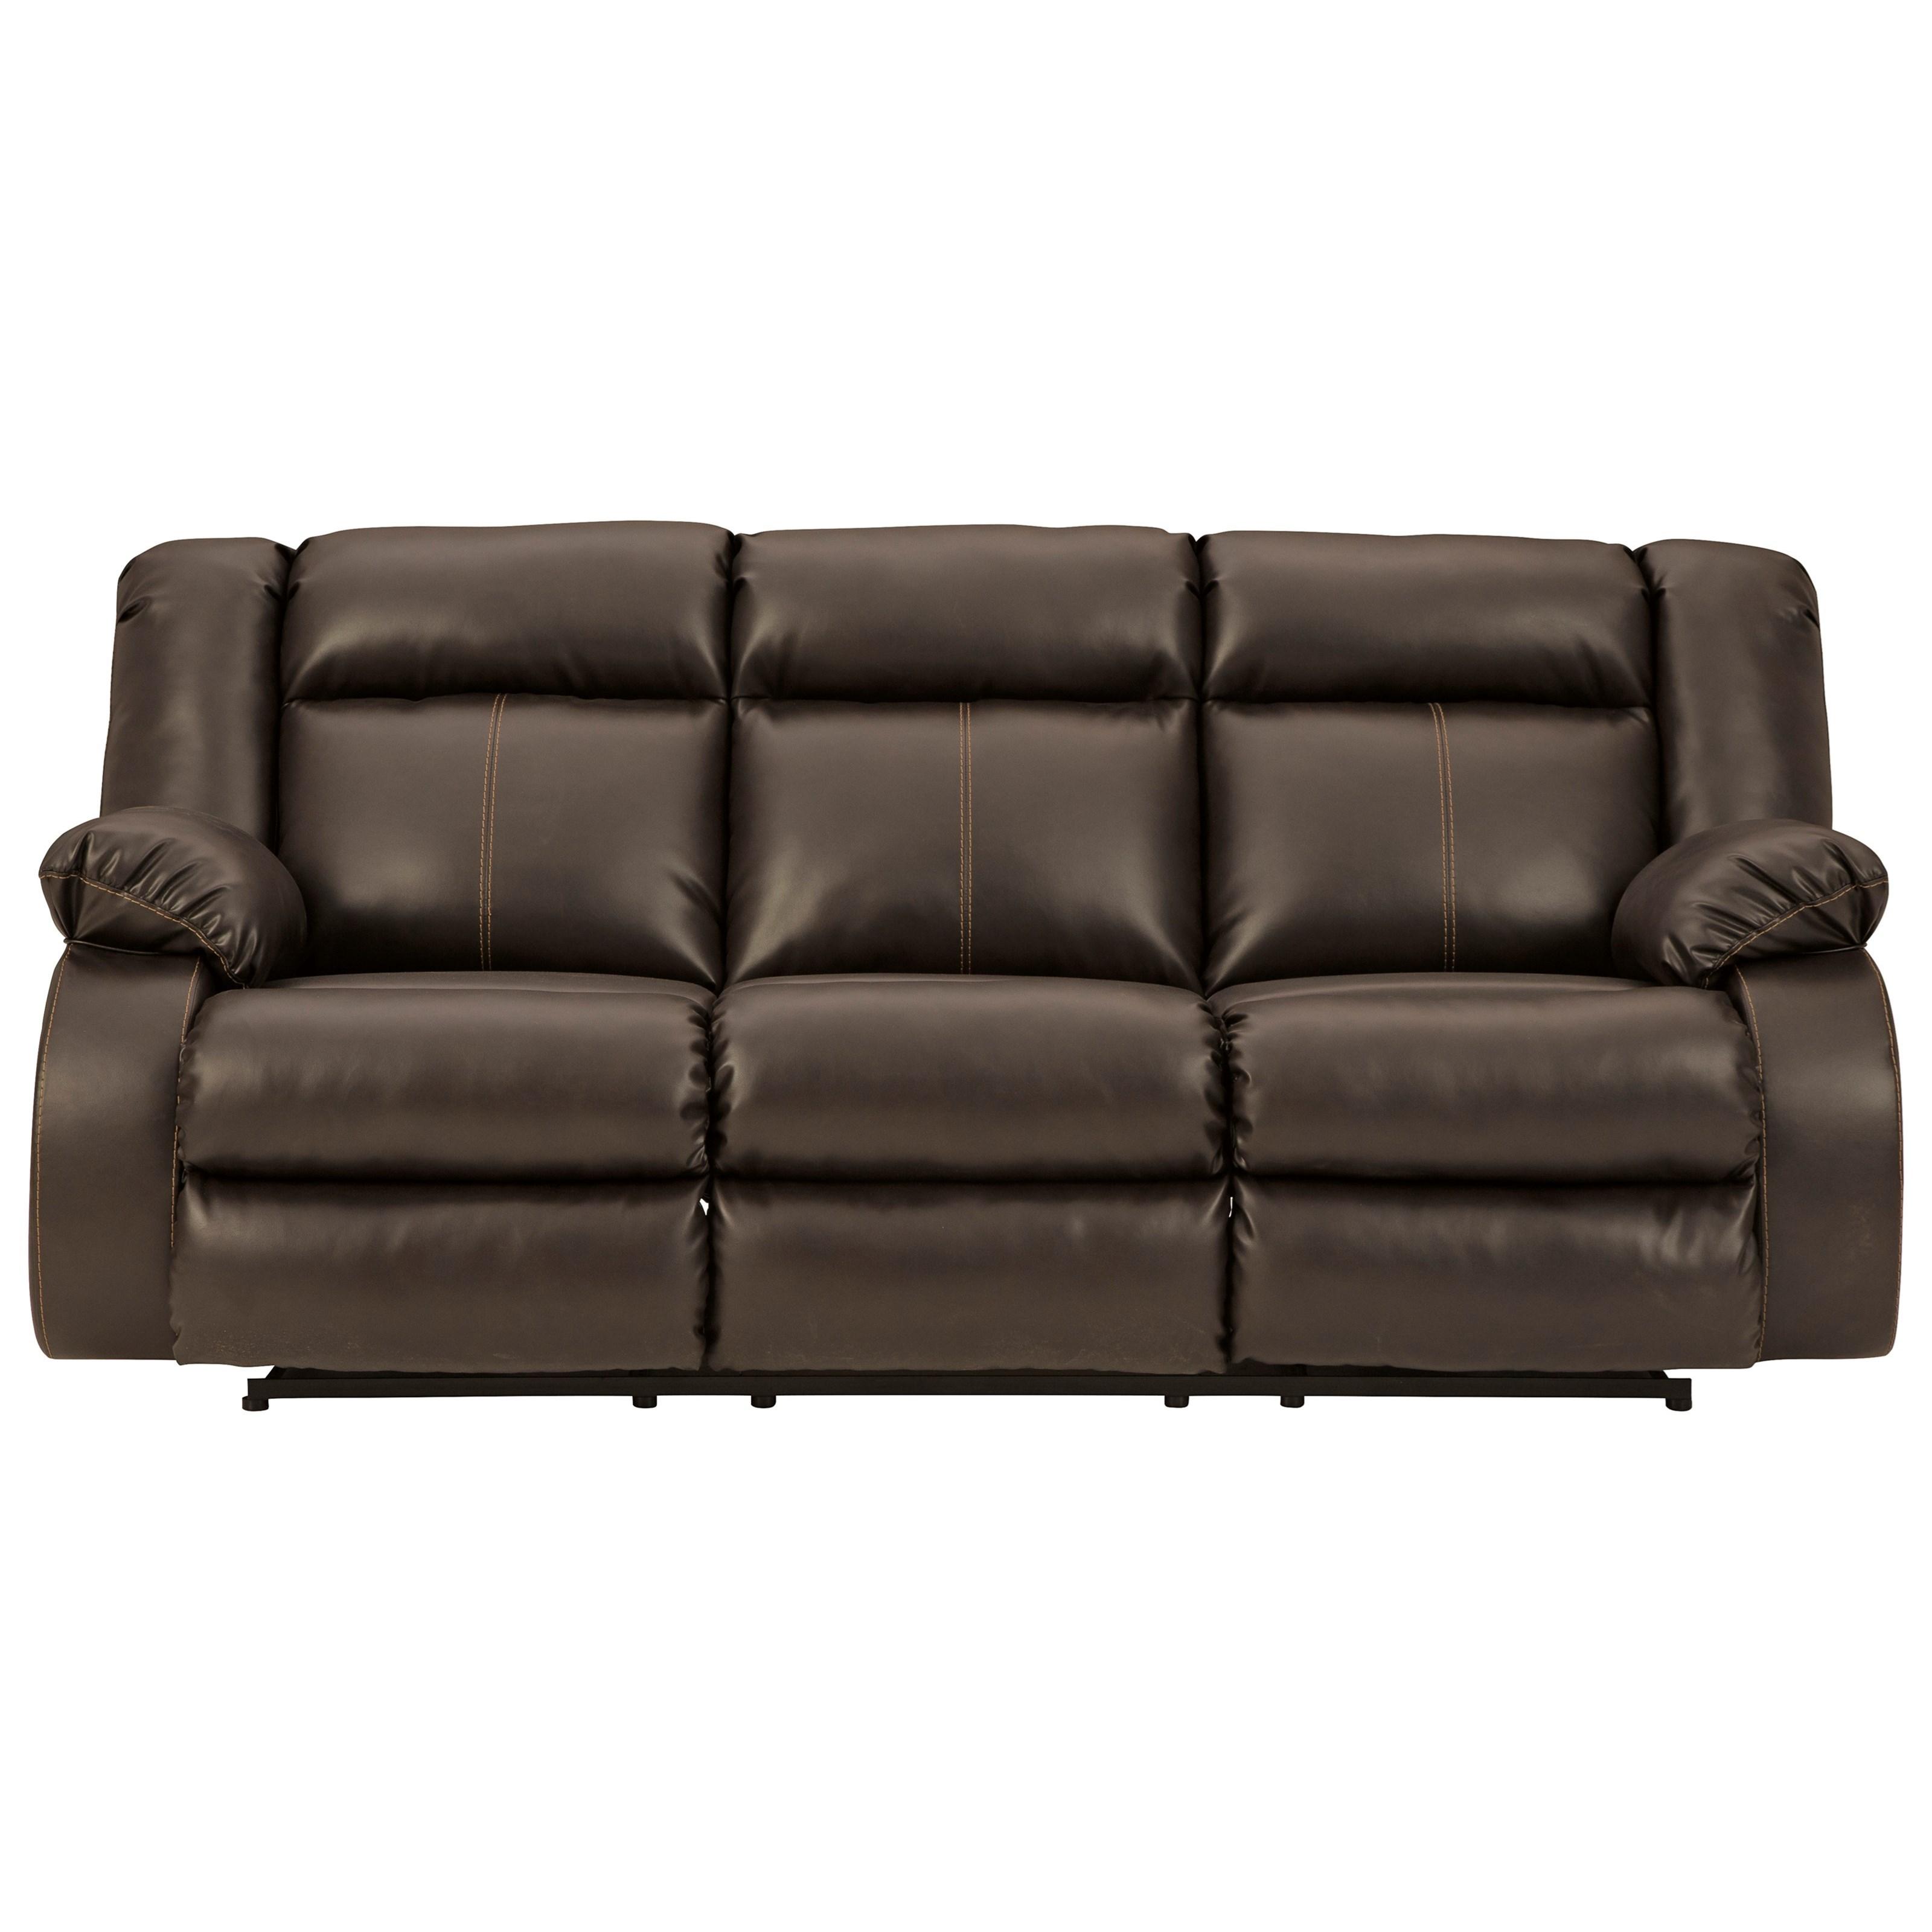 Denoron Power Reclining Sofa by Ashley (Signature Design) at Johnny Janosik